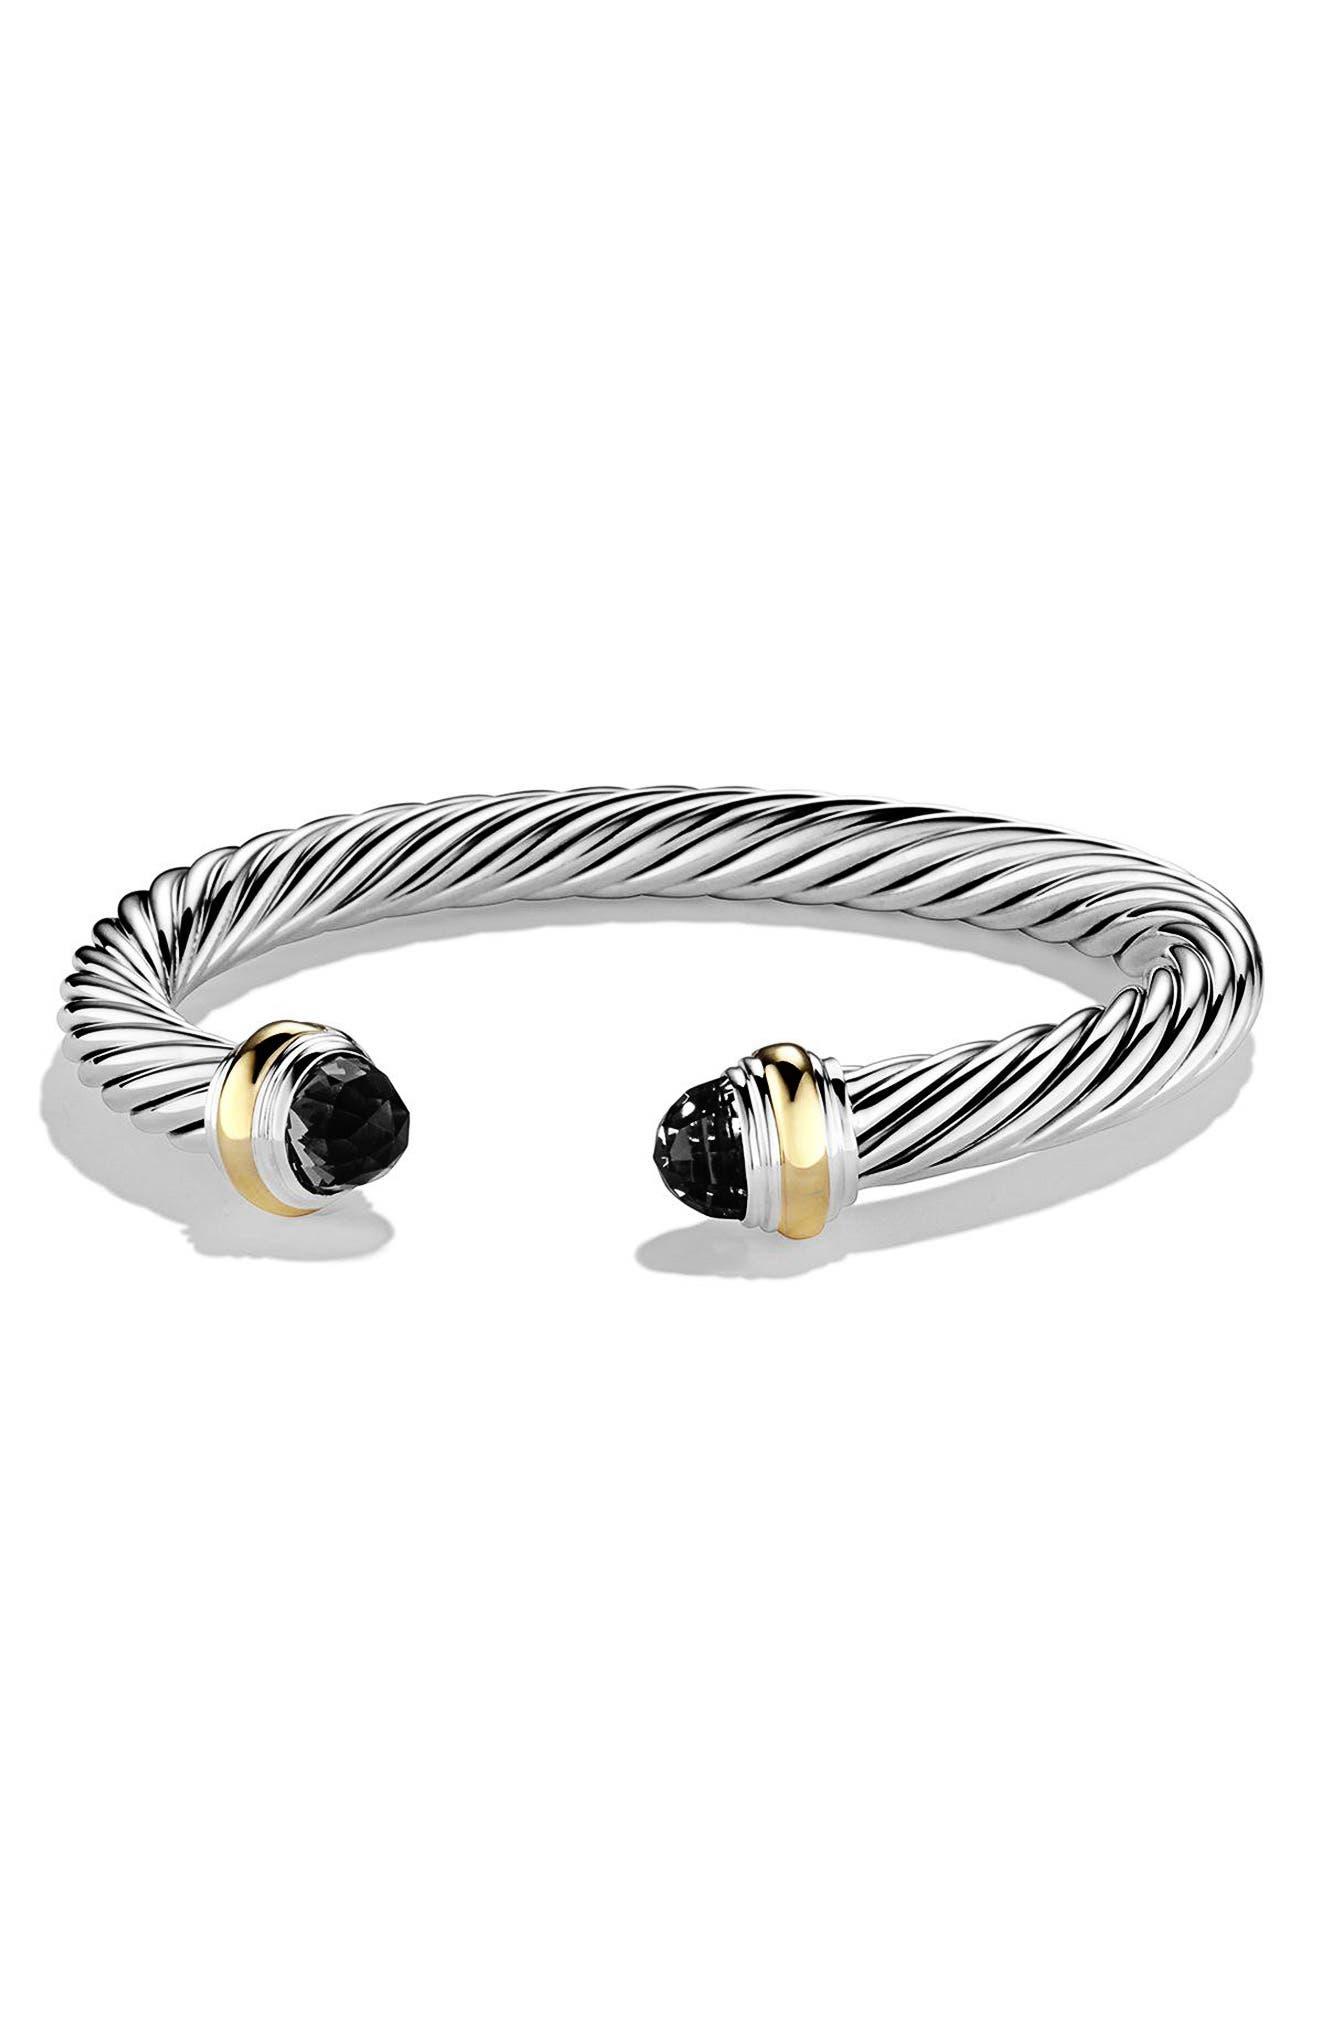 David Yurman Cable Classics Bracelet with Semiprecious Stones